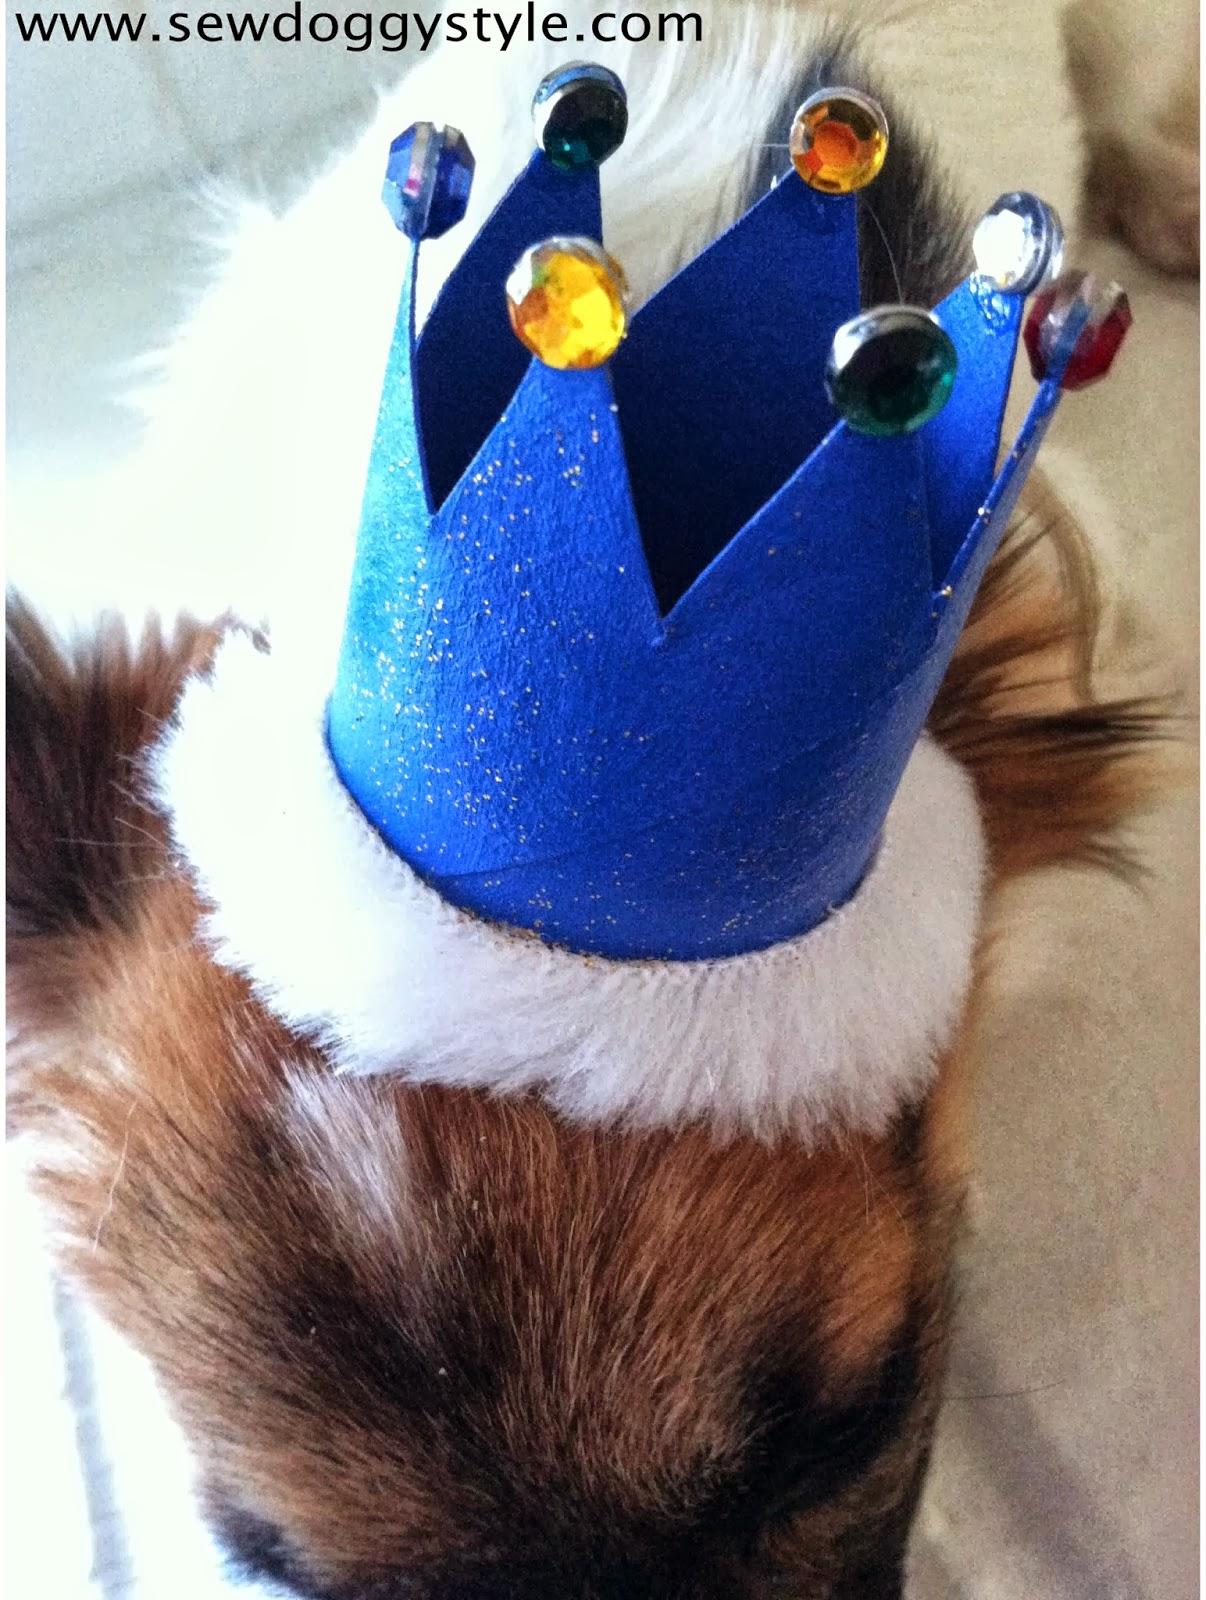 Sew Doggystyle Diy No Sew Mini Dog Crown